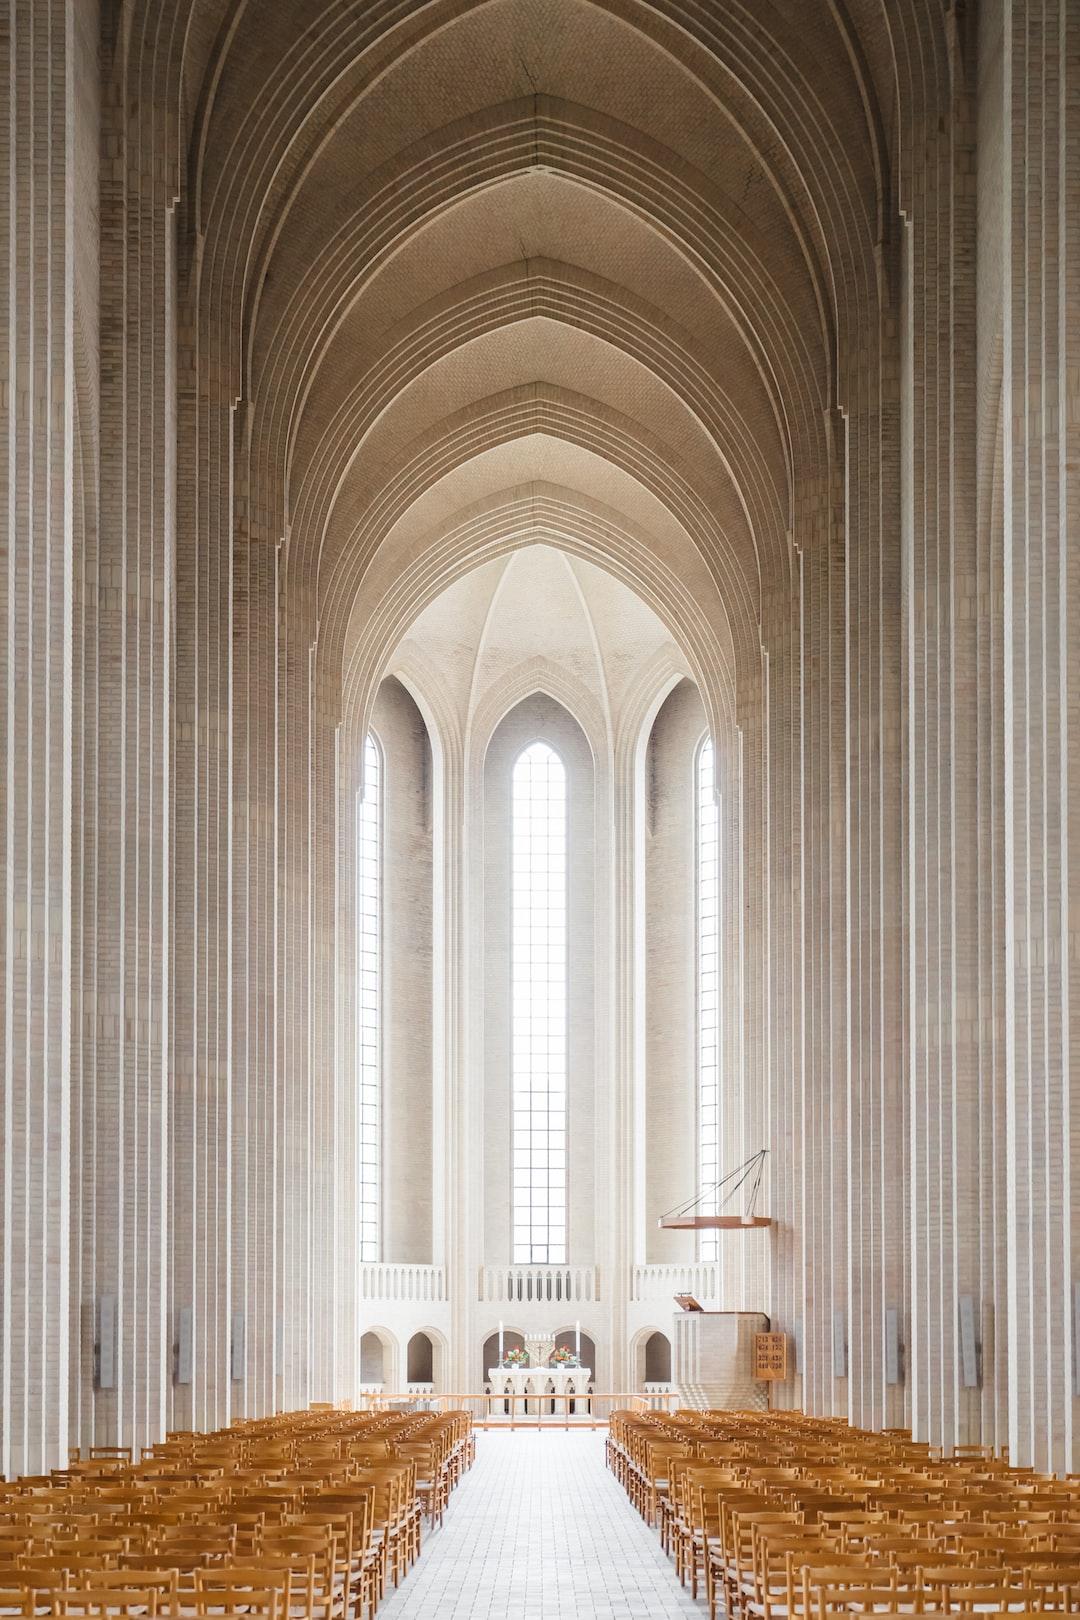 empty cathedral <b>interior</b> photo – Free Architecture Image on Unsplash